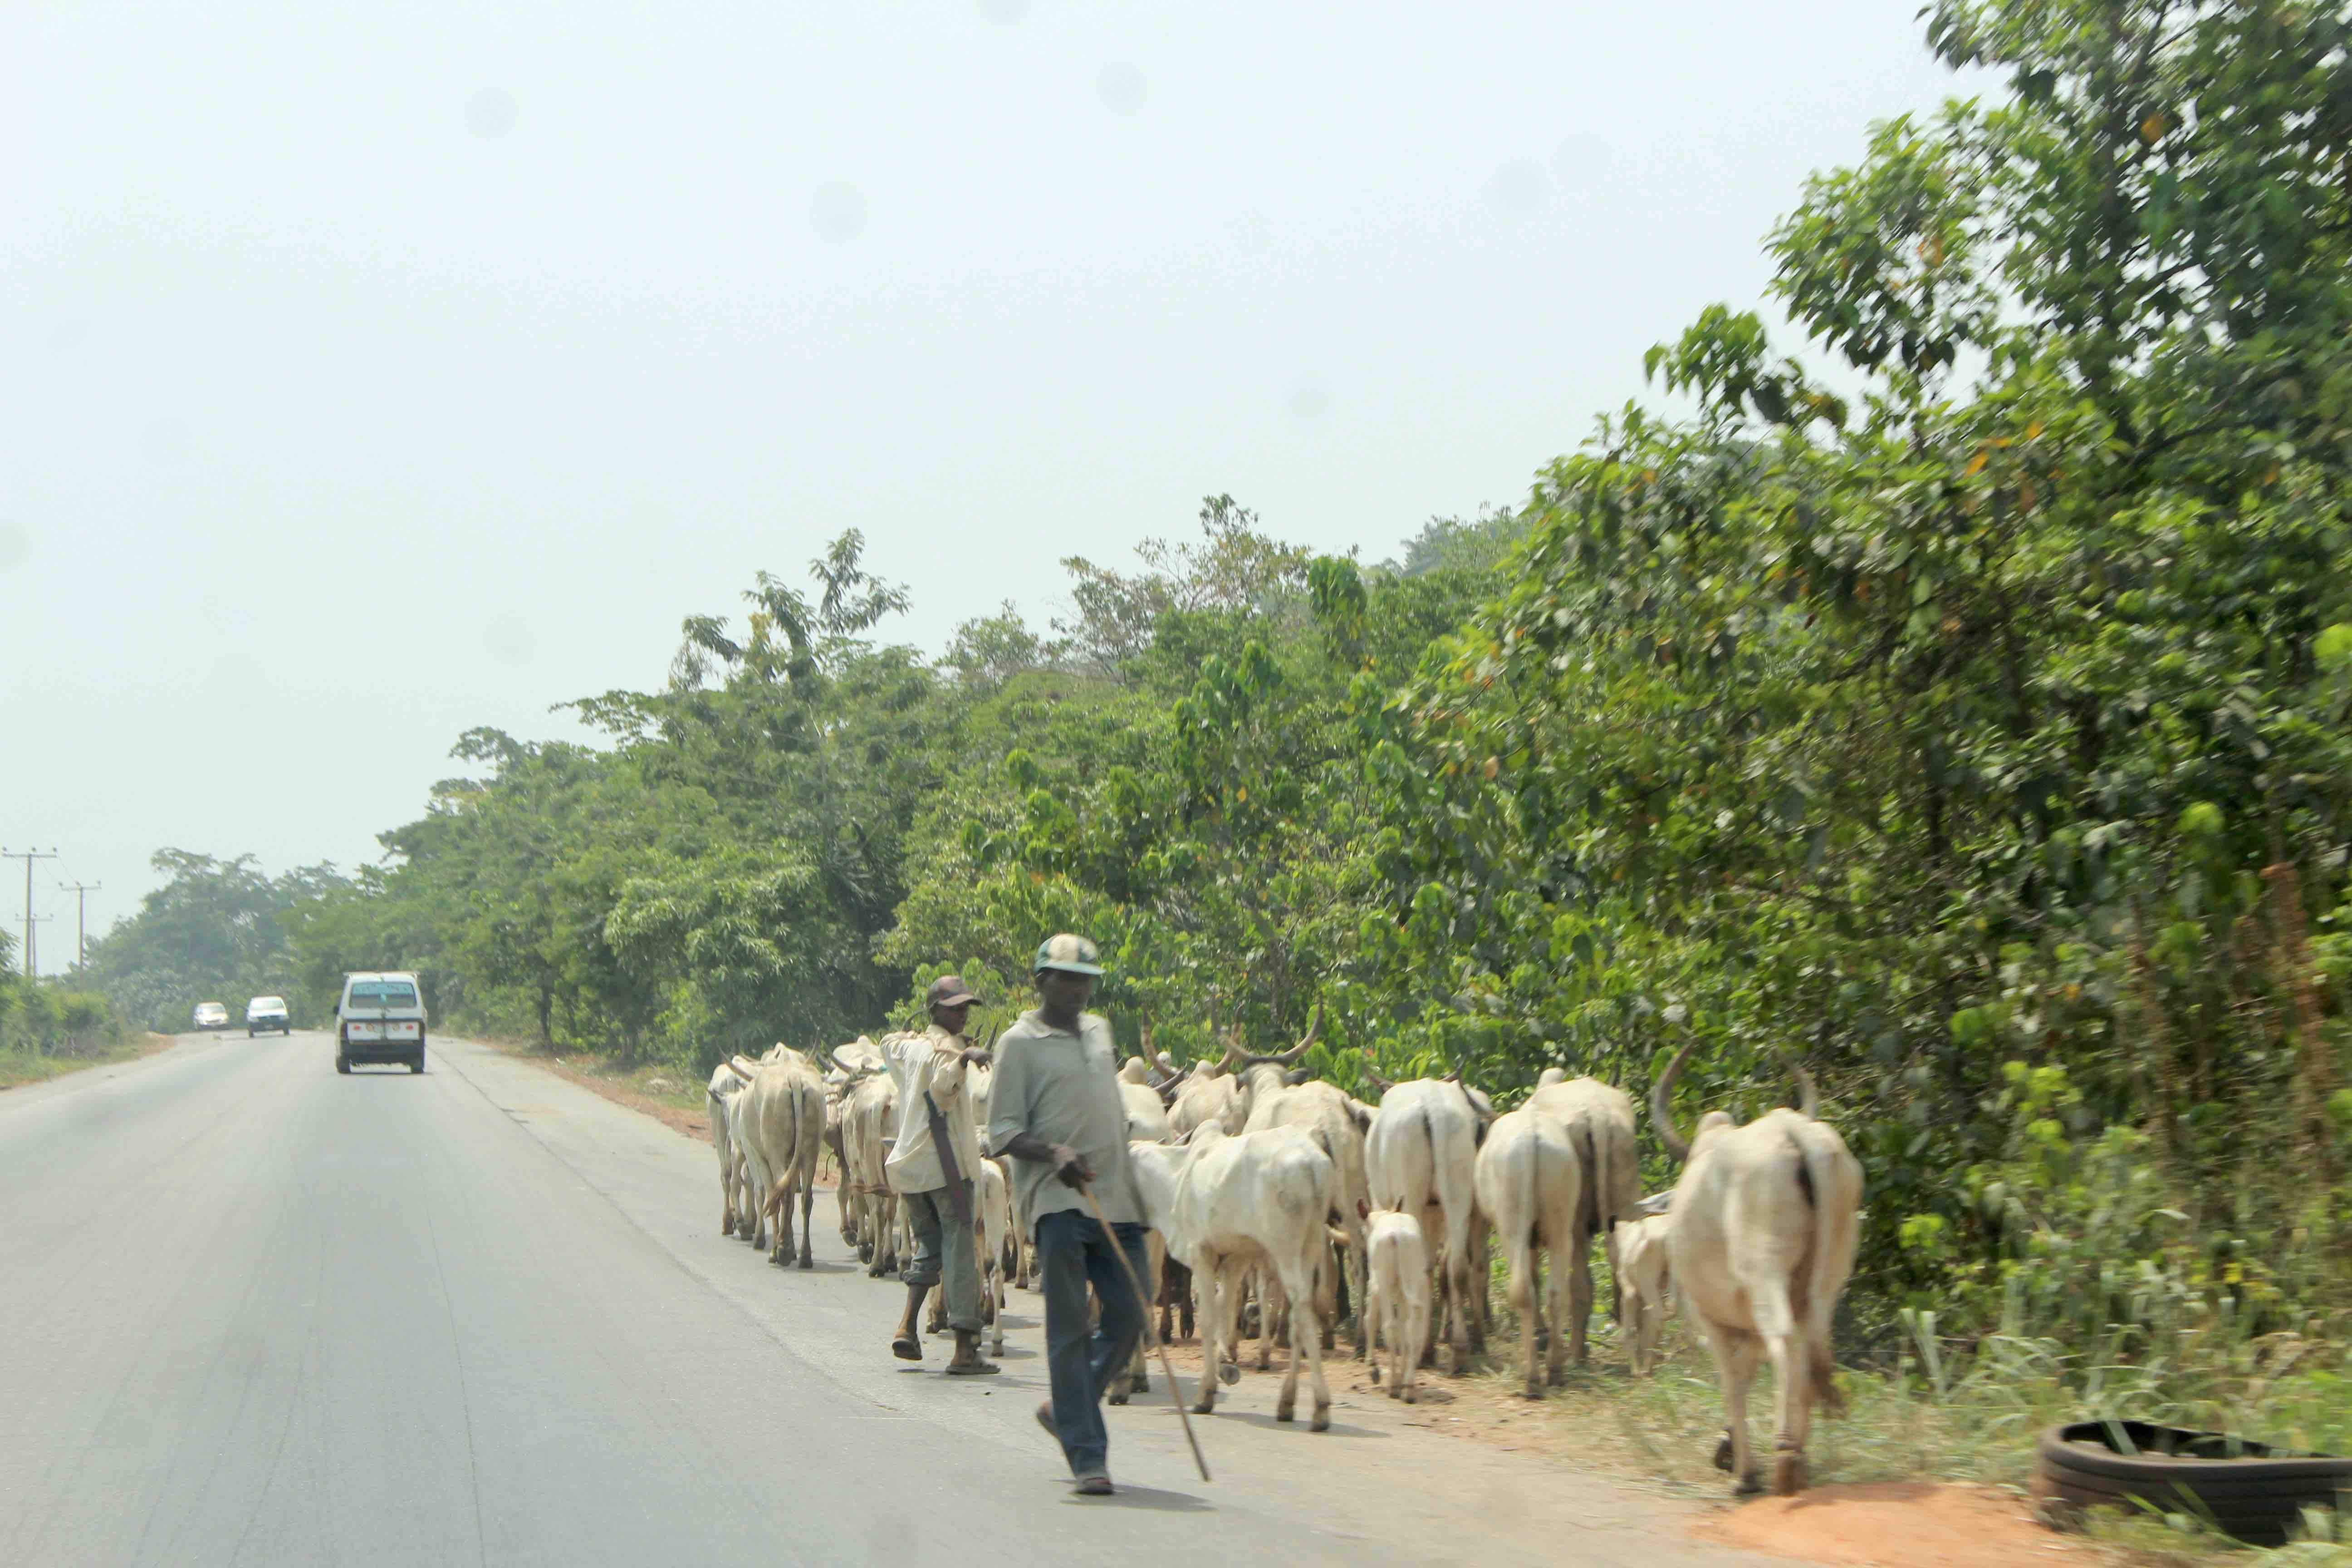 Fulani Herdsmen and cattle, Ilesa, Osun State, Nigeria. #JujuFilms